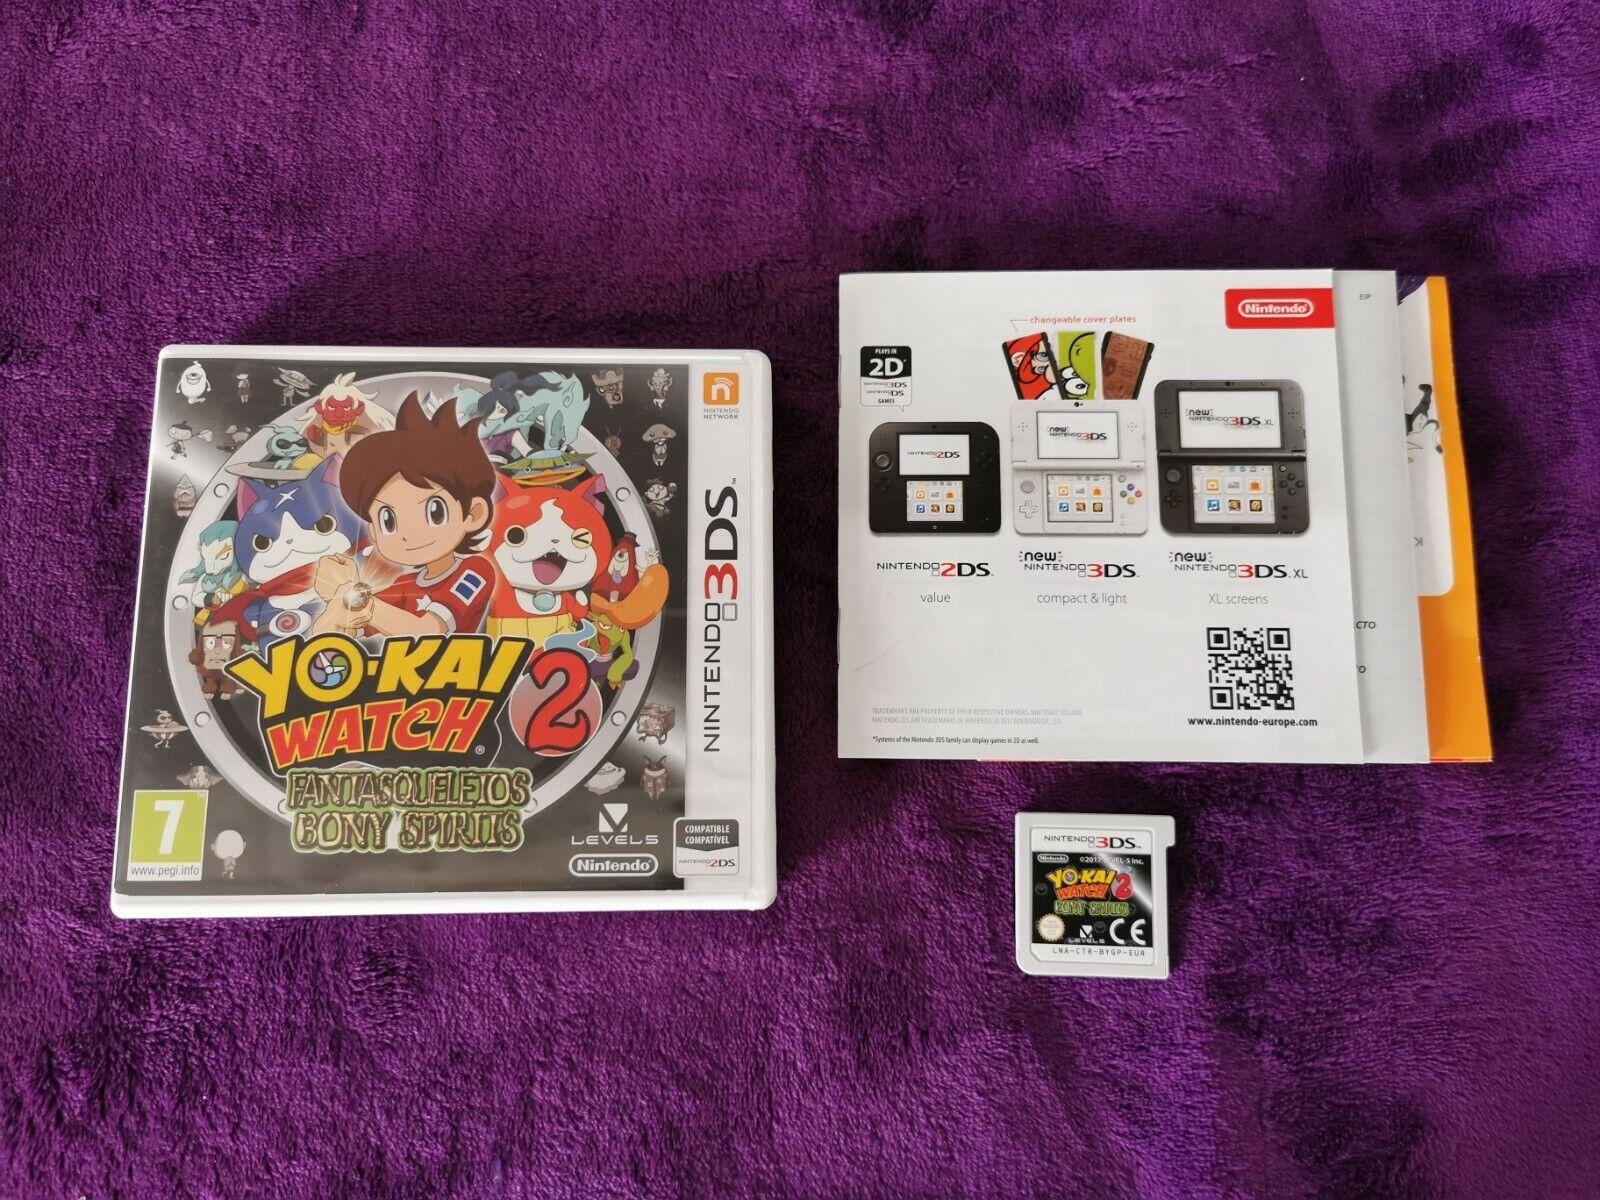 YO-KAI WATCH 2 FANTAESQUELETOS YOKAI 3Ds Muy Buen Estado PAL ESP Nintendo